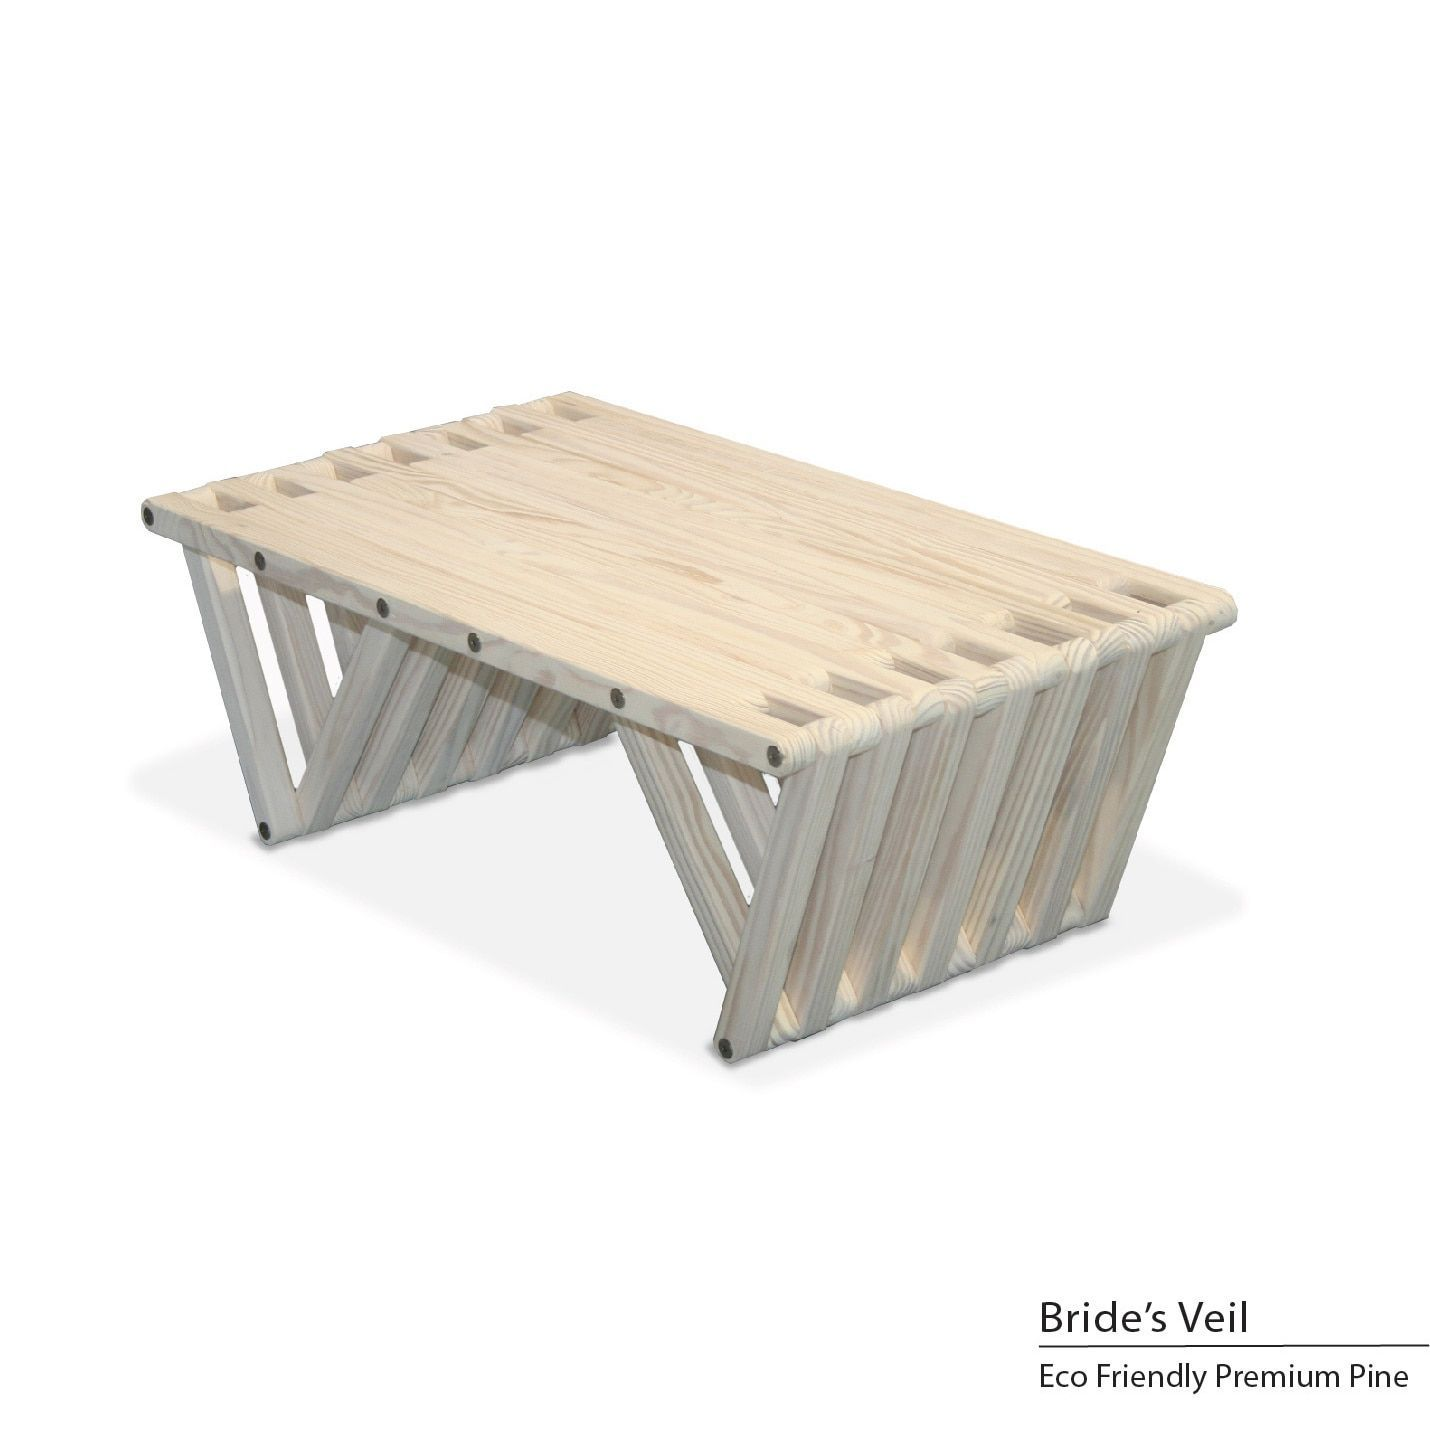 Glodea Eco Friendly Coffee Table X36 Bride S Veil White Patio Furniture